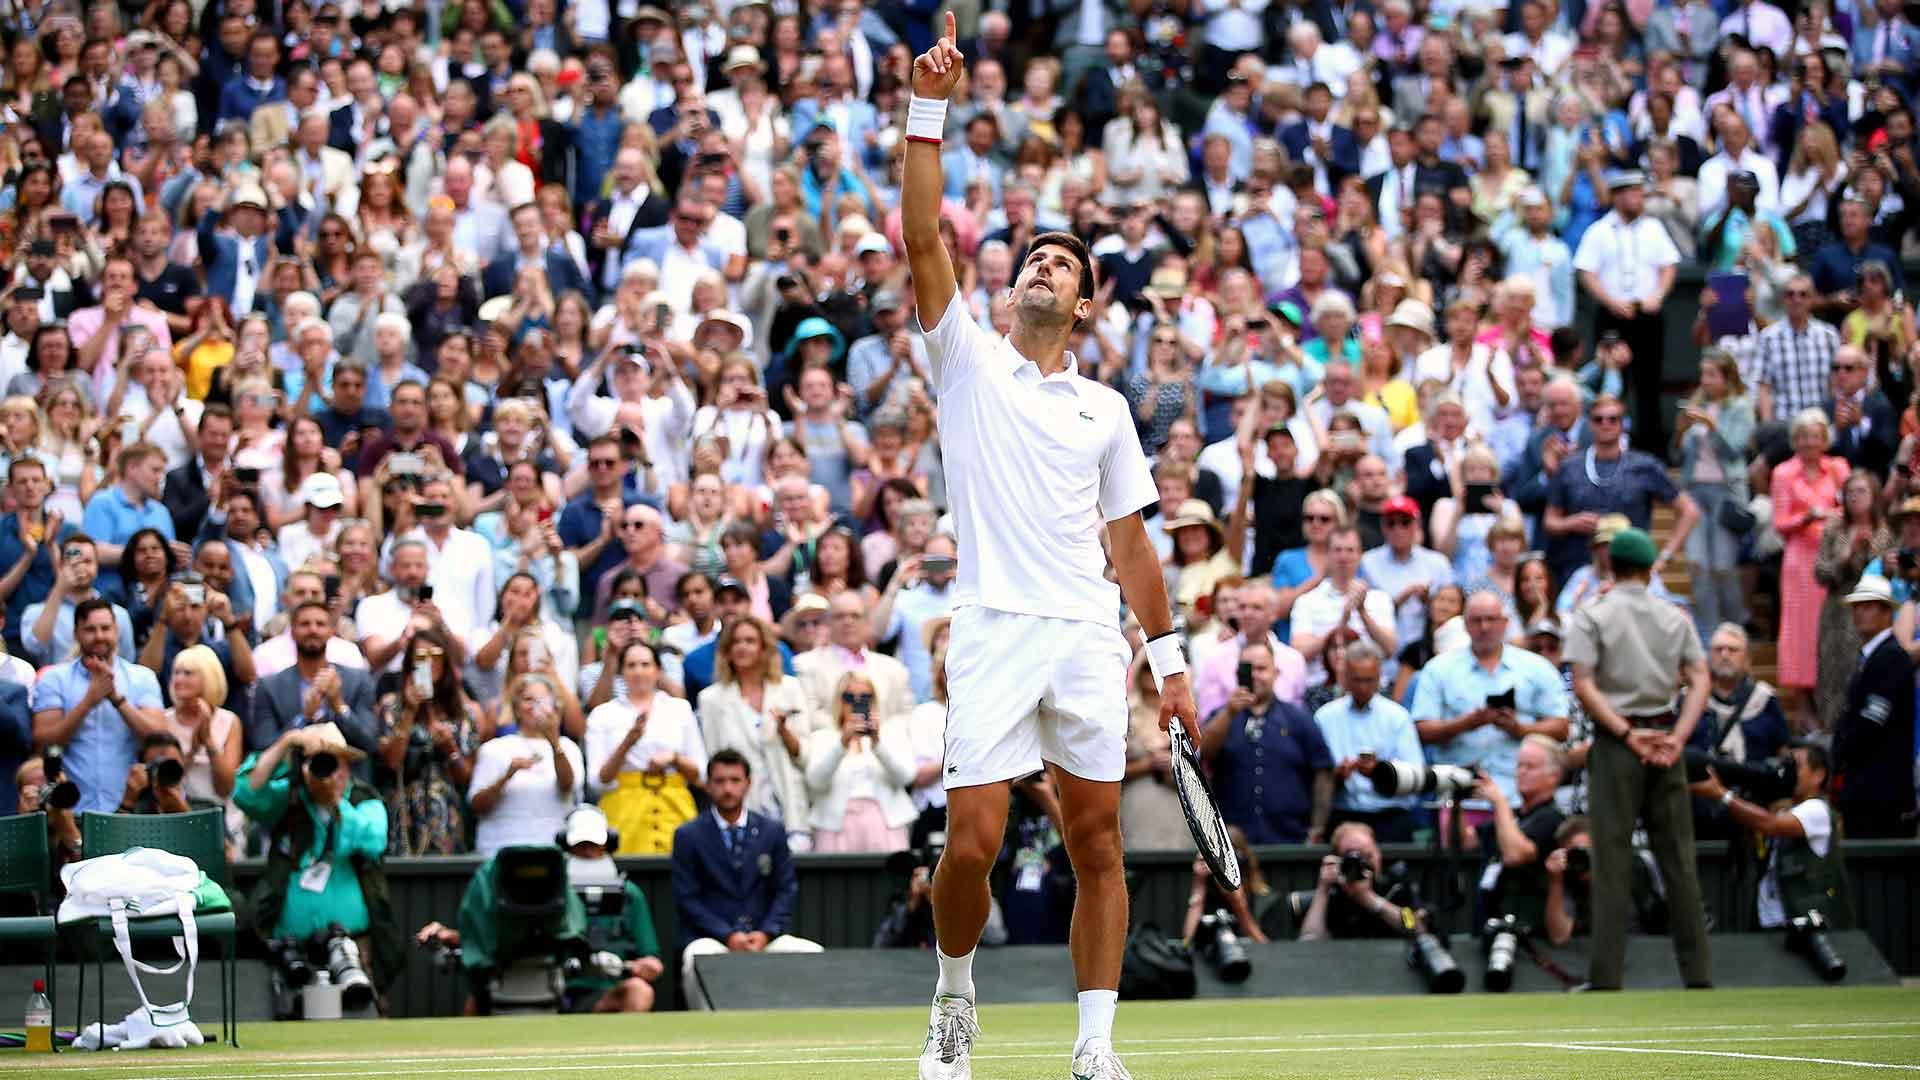 <a href='/en/players/novak-djokovic/d643/overview'>Novak Djokovic</a> celebrates winning his fifth <a href='/en/tournaments/wimbledon/540/overview'>Wimbledon</a> title on Sunday.